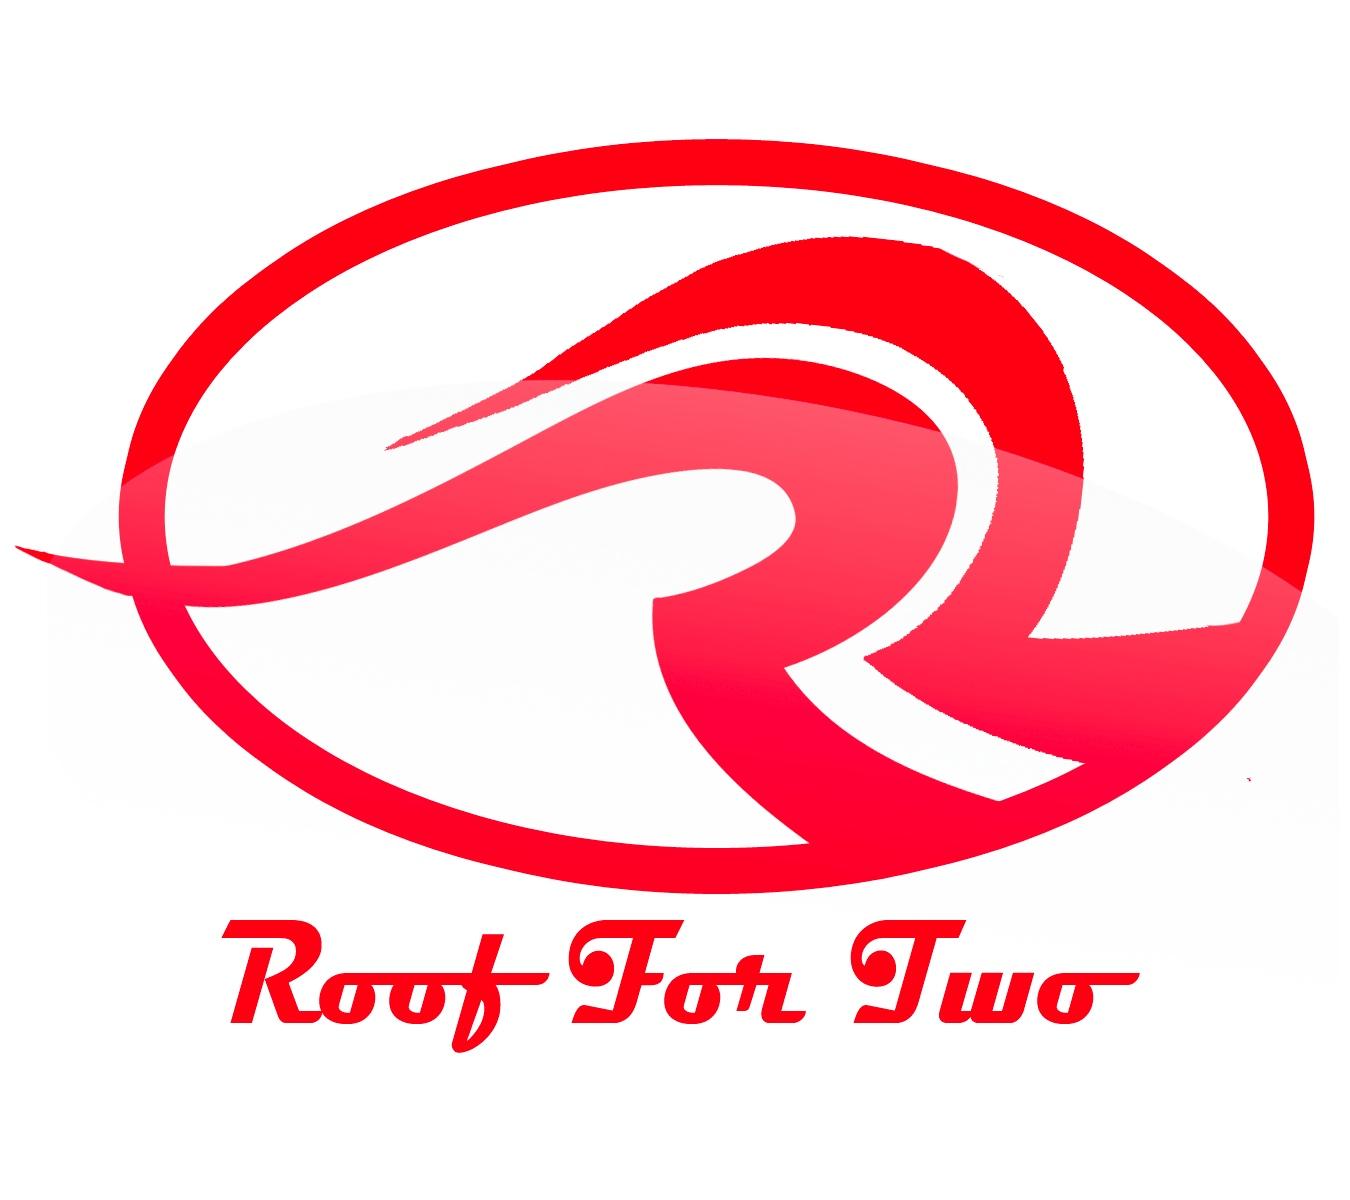 RF2 Red Logo.jpg